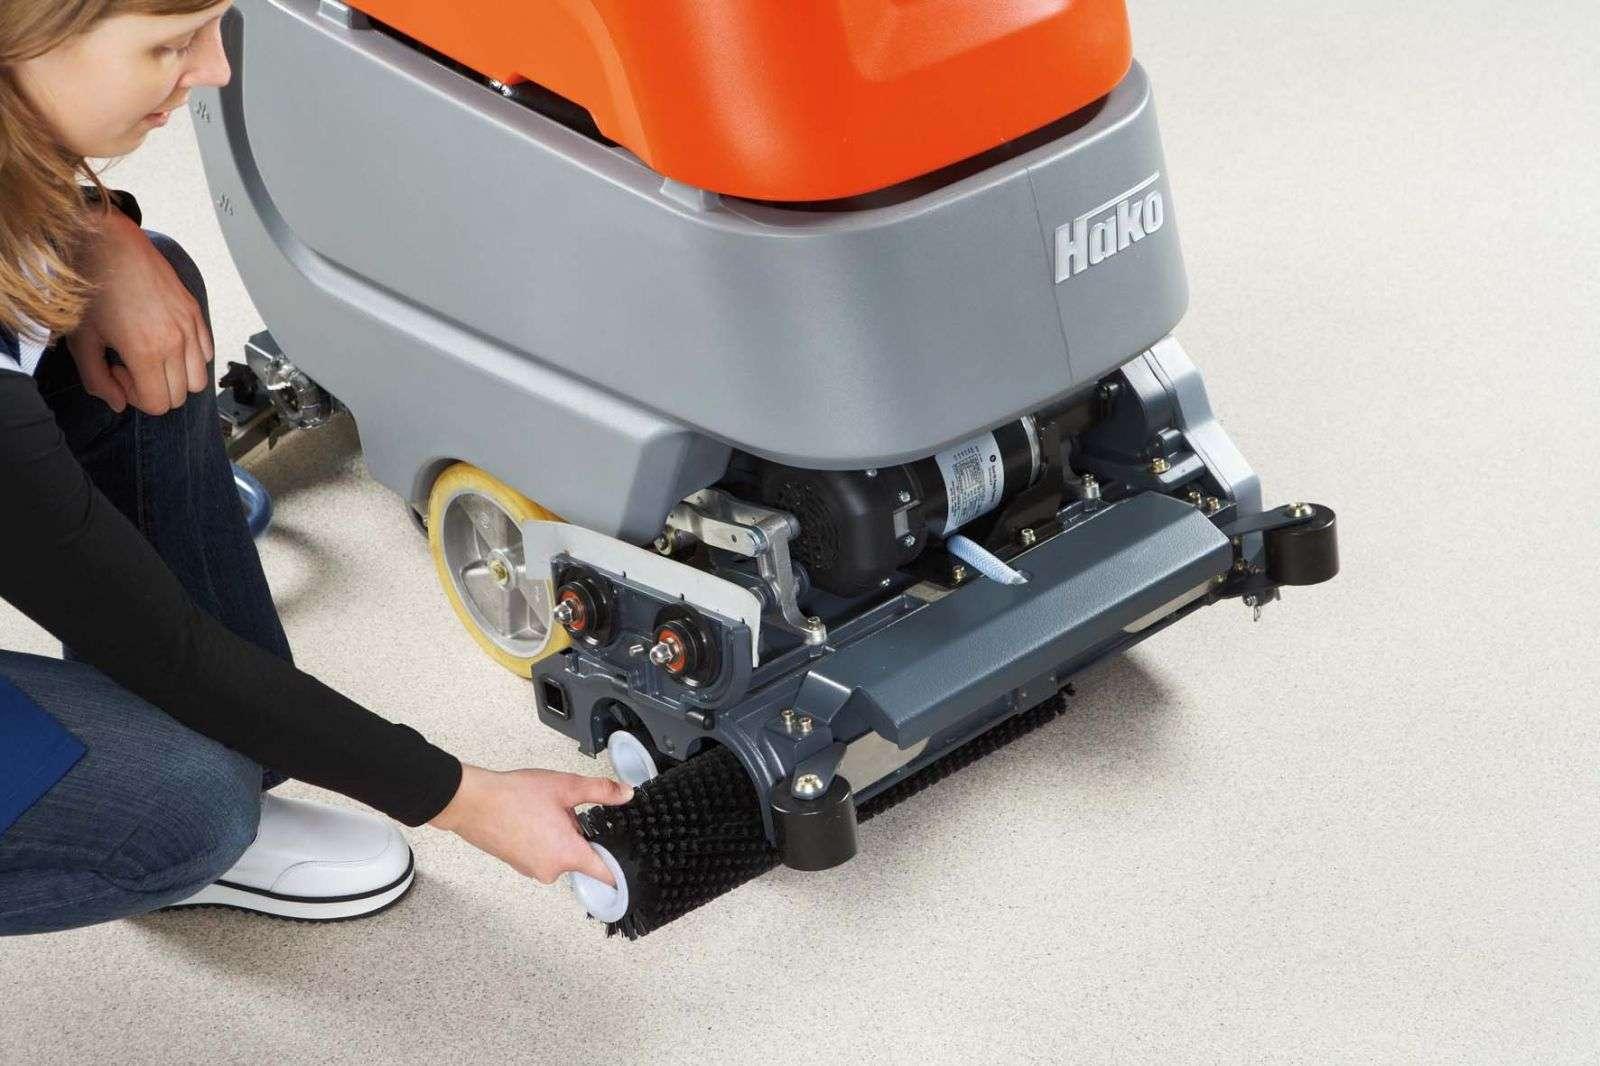 Hako Scrubmaster B45 Scrubber Powervac Cleaning